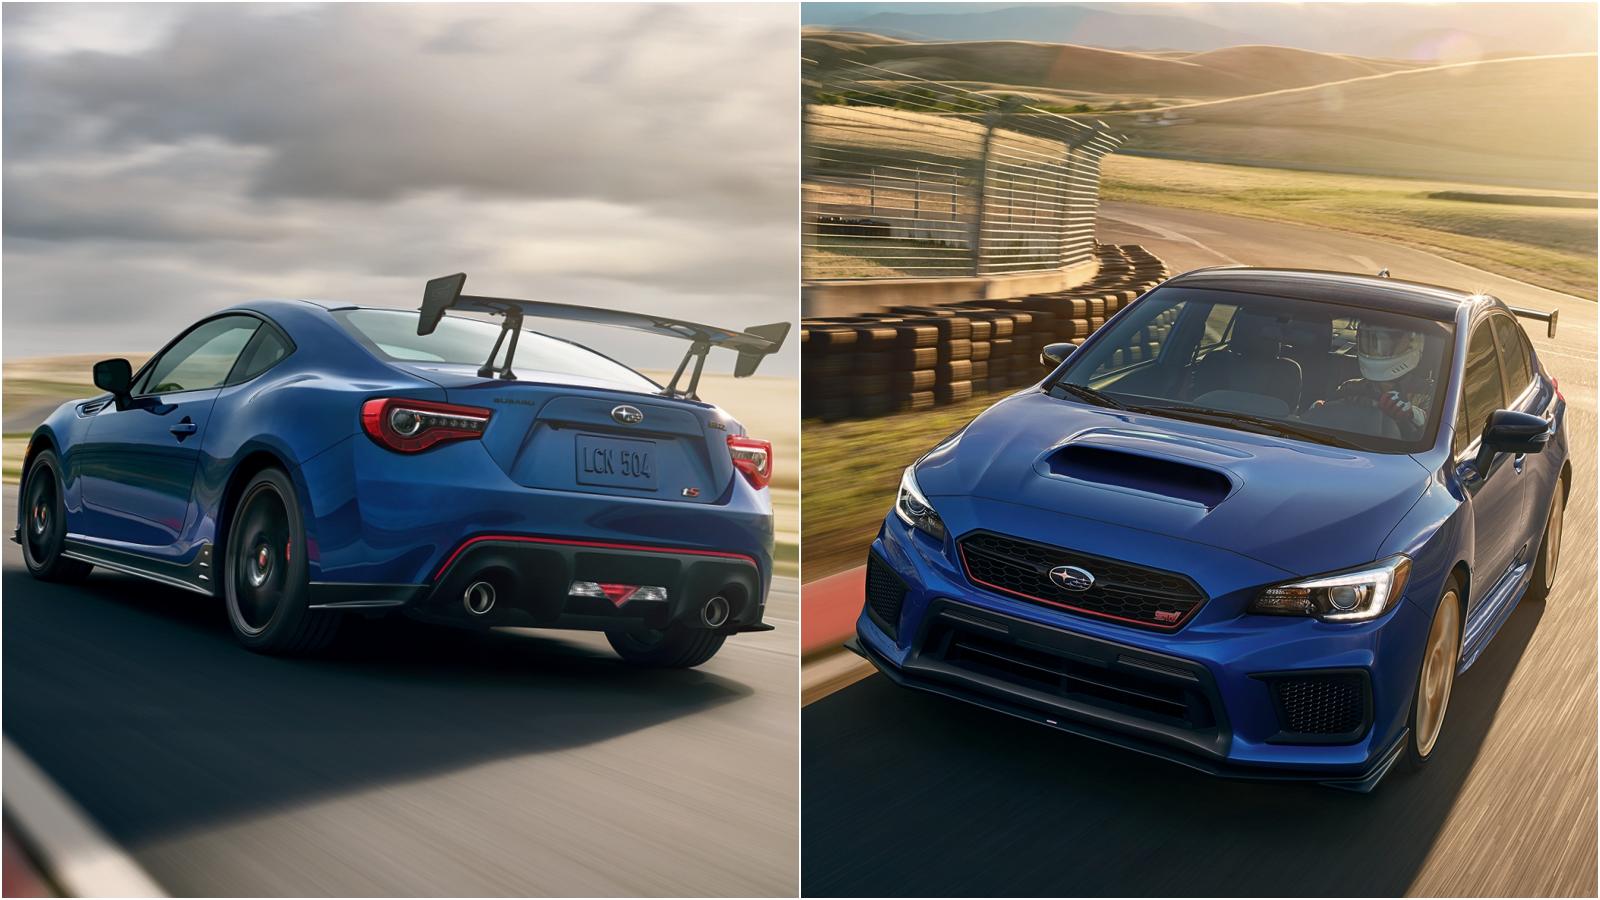 Sti Type Ra >> News - Subaru Of America Reveals BRZ tS, WRX STI Type RA